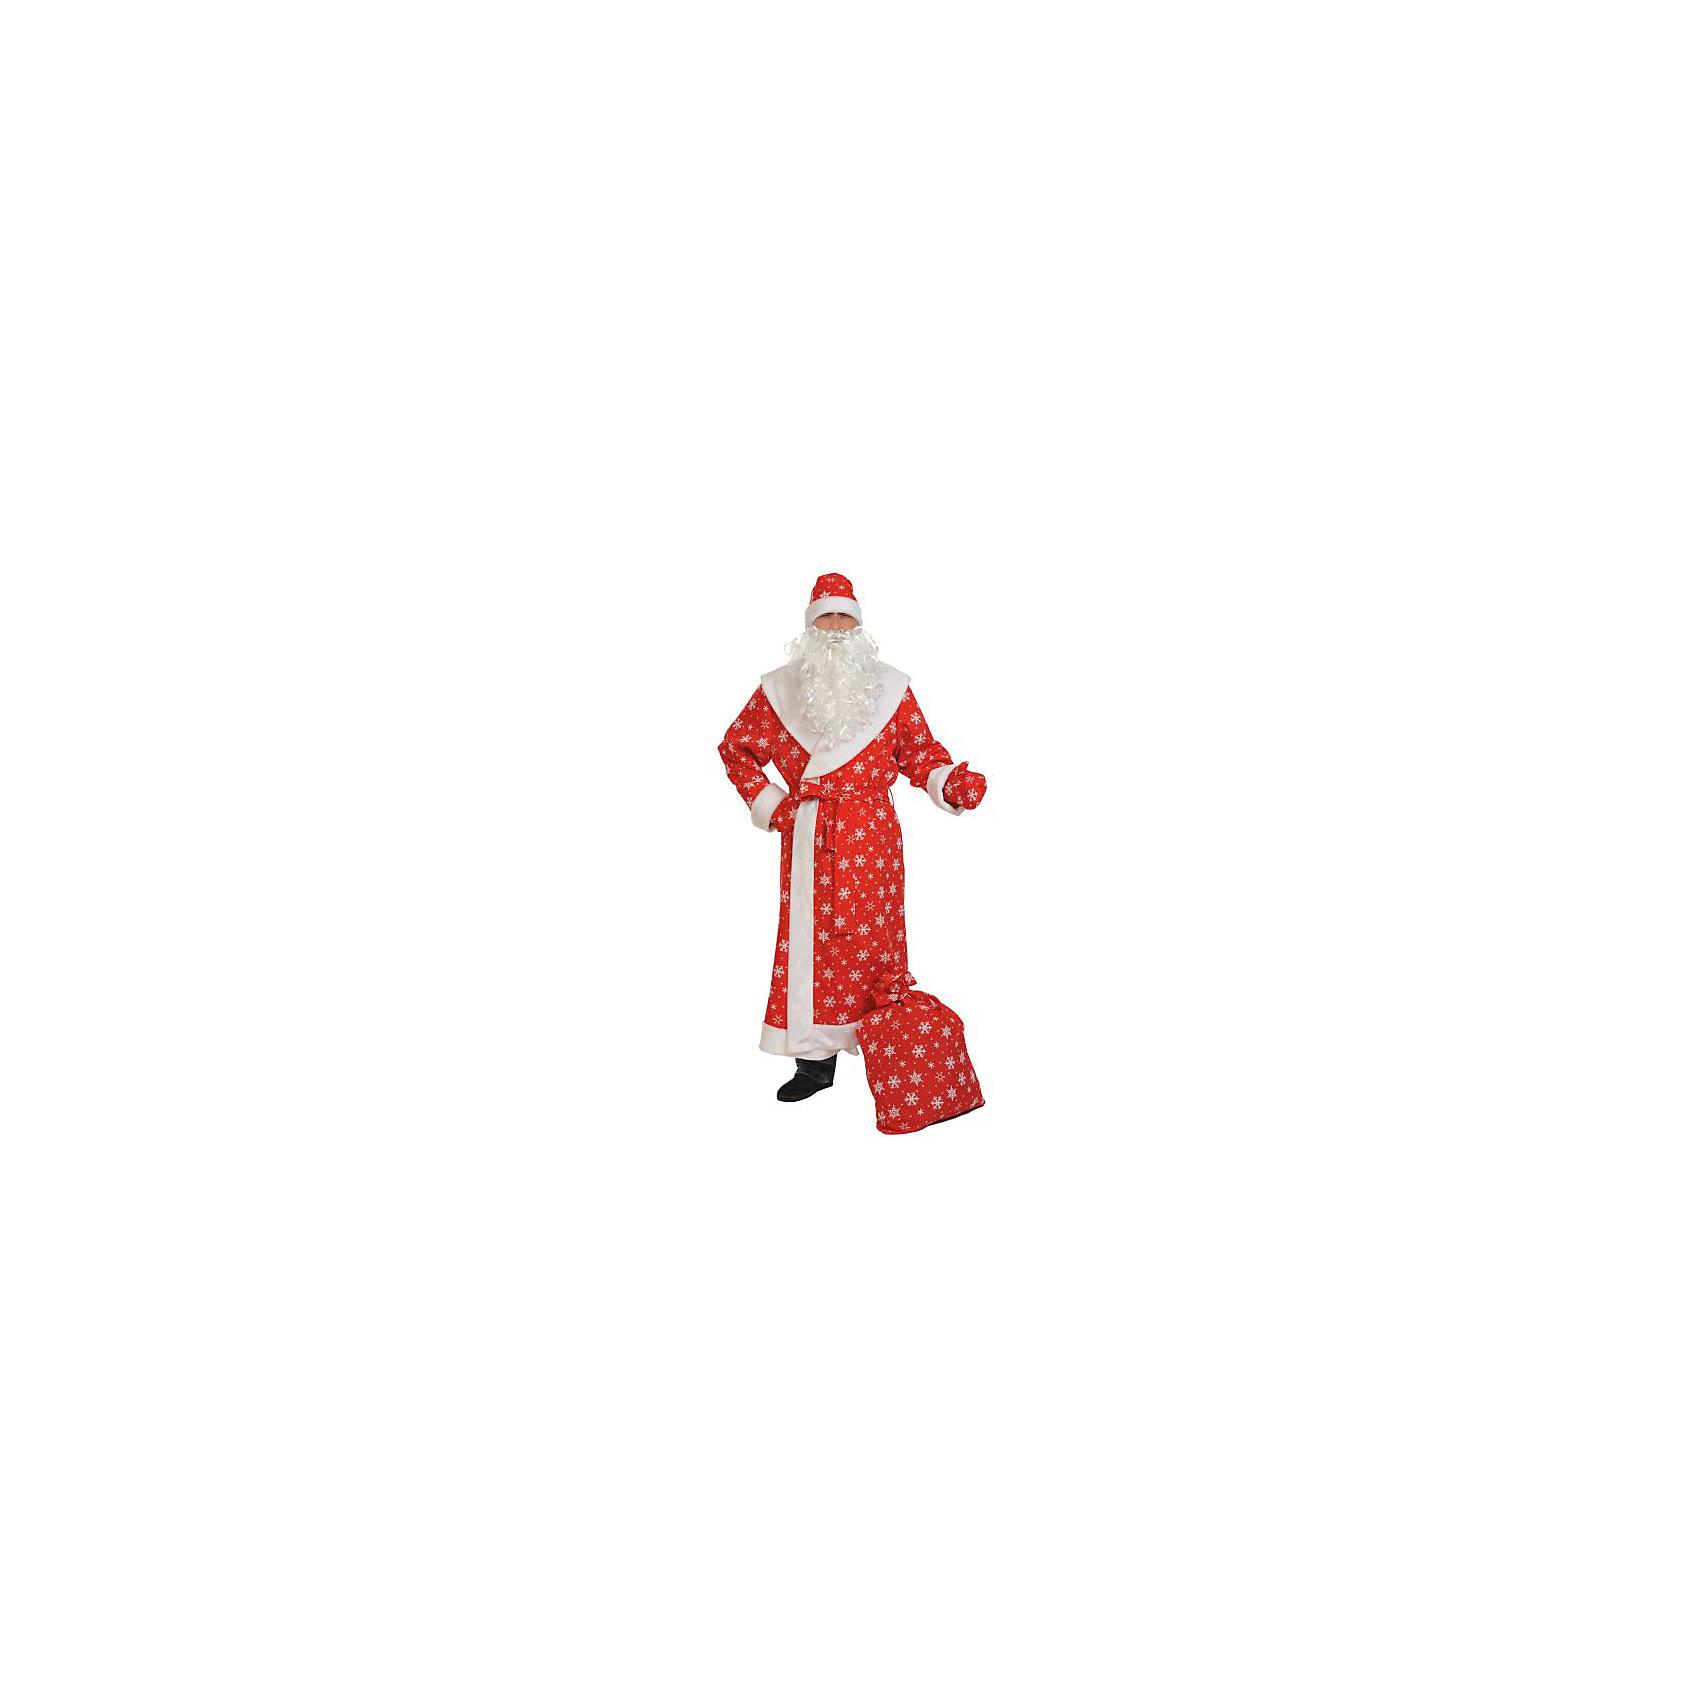 Костюм Дед мороз, размер XL 56-58/188, Карнавалофф от myToys